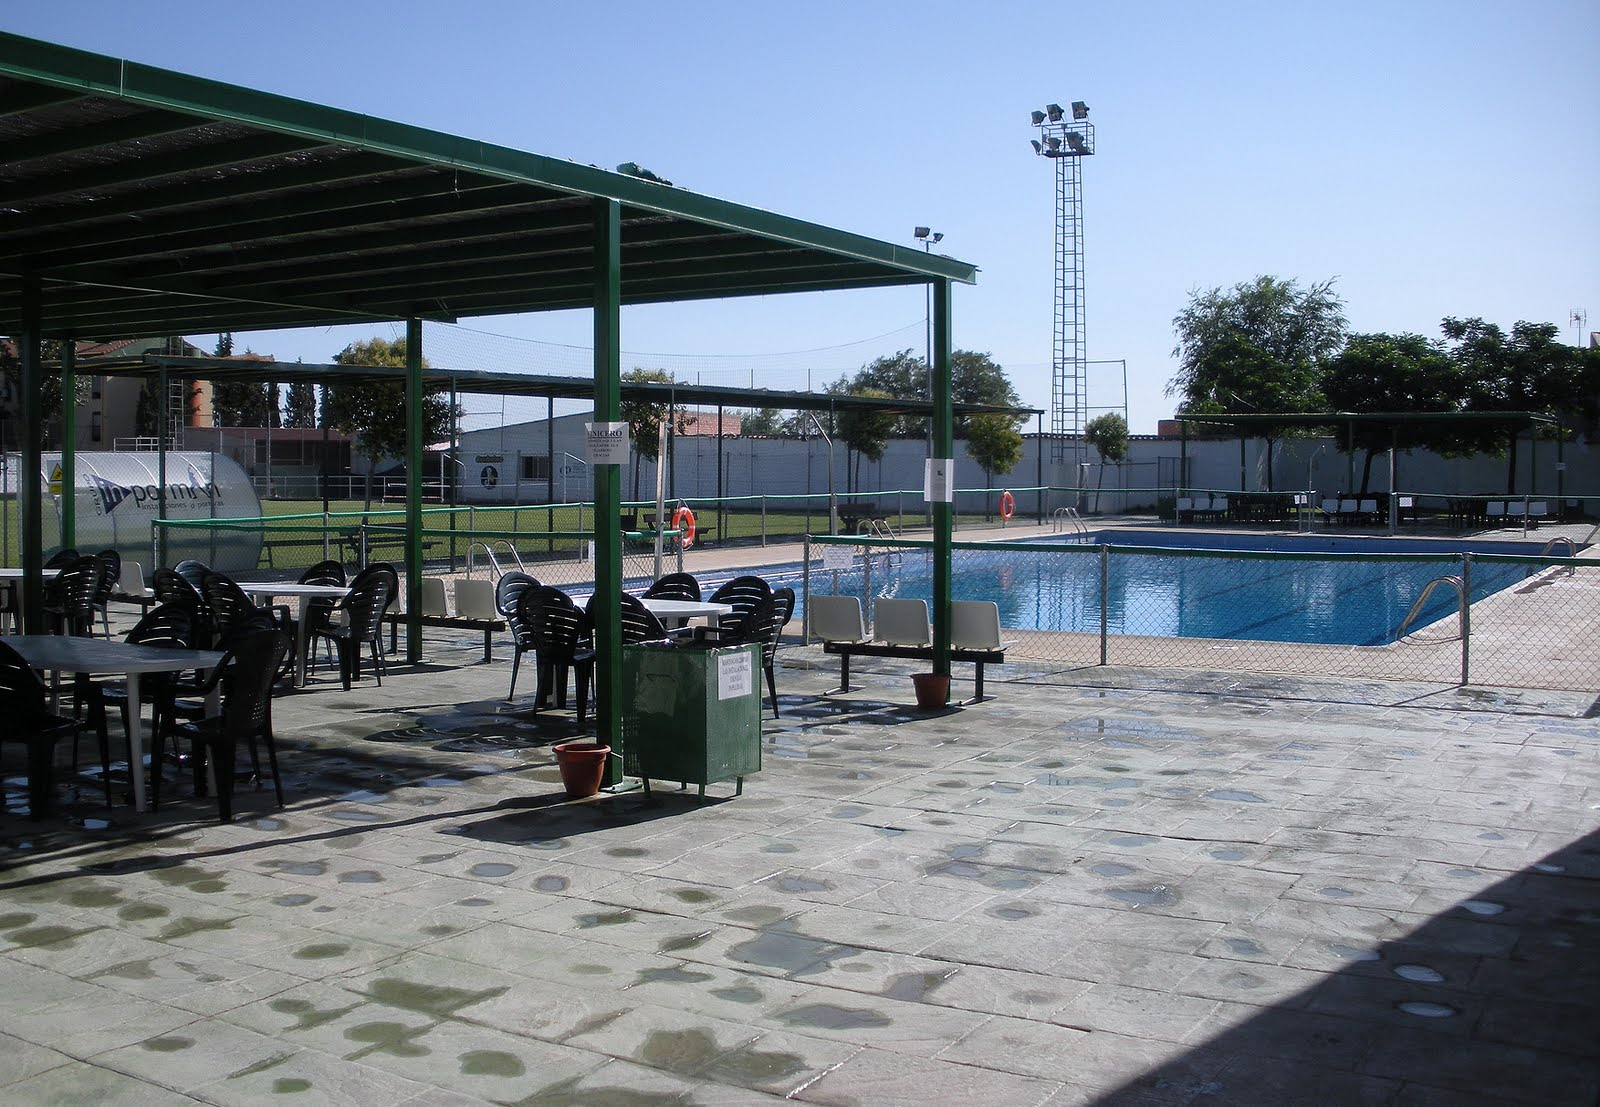 La gente aldeana apertura de la piscina municipal for Piscina el pardo